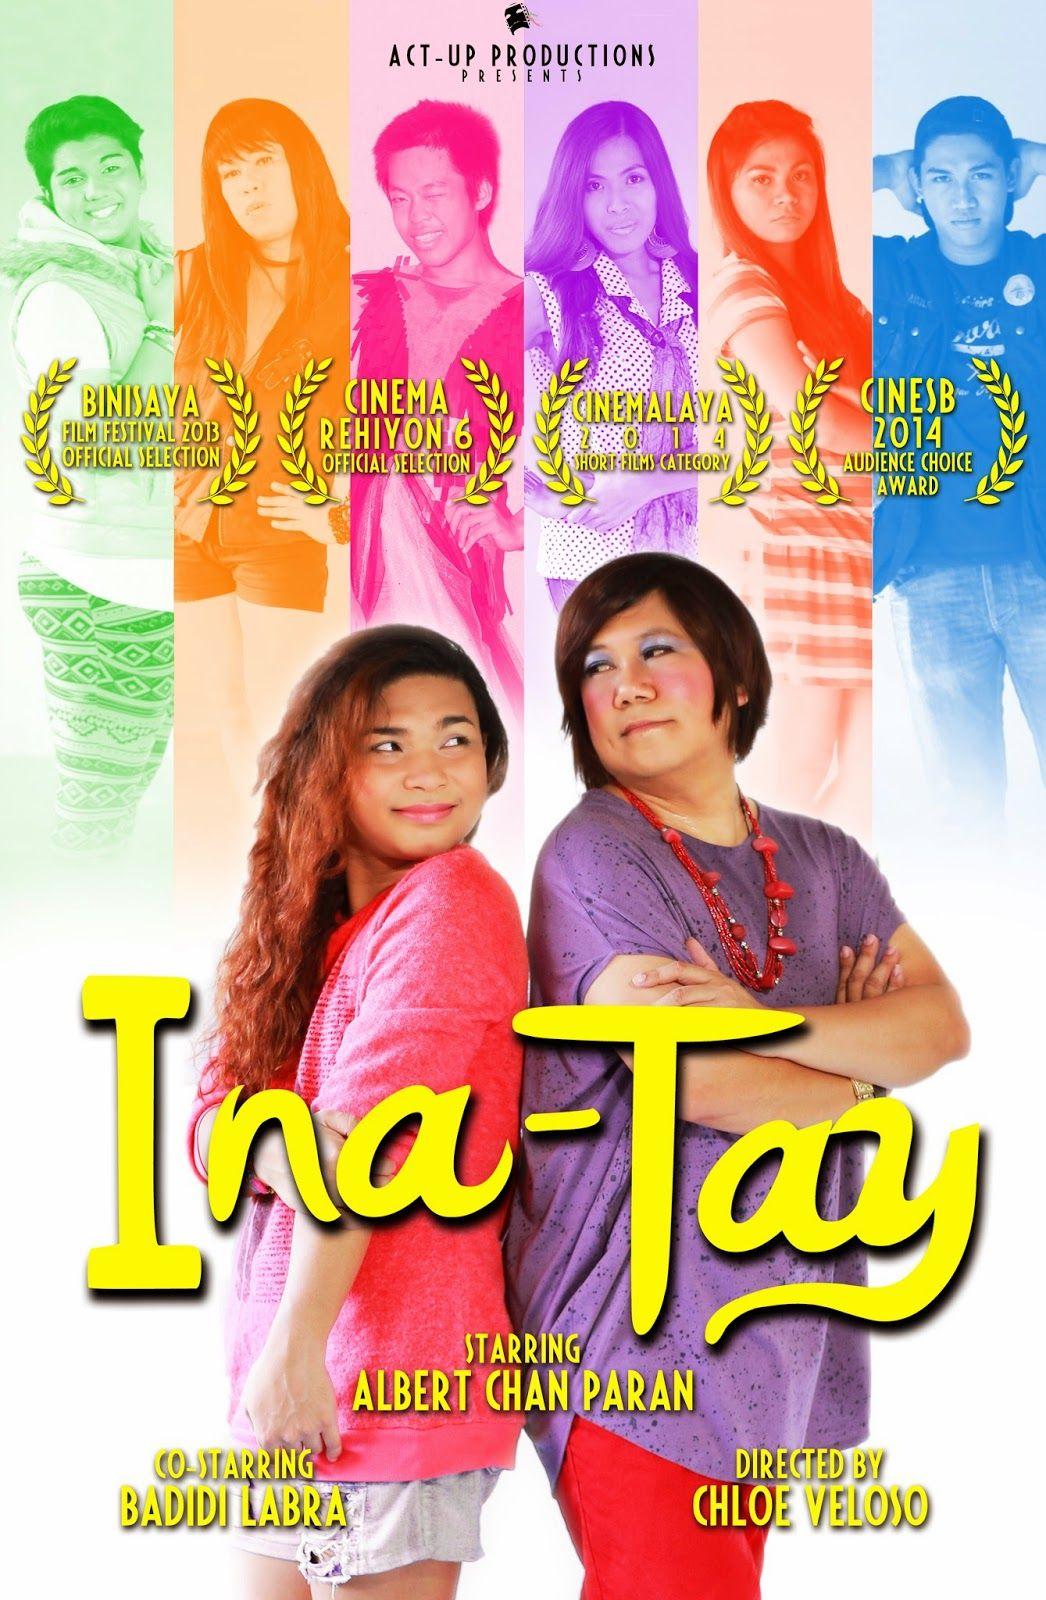 I626leo Gebet Und Arbeit Ina Tay By Chloe Veloso Cinemalayax Streaming Movies Misery Movie Movies